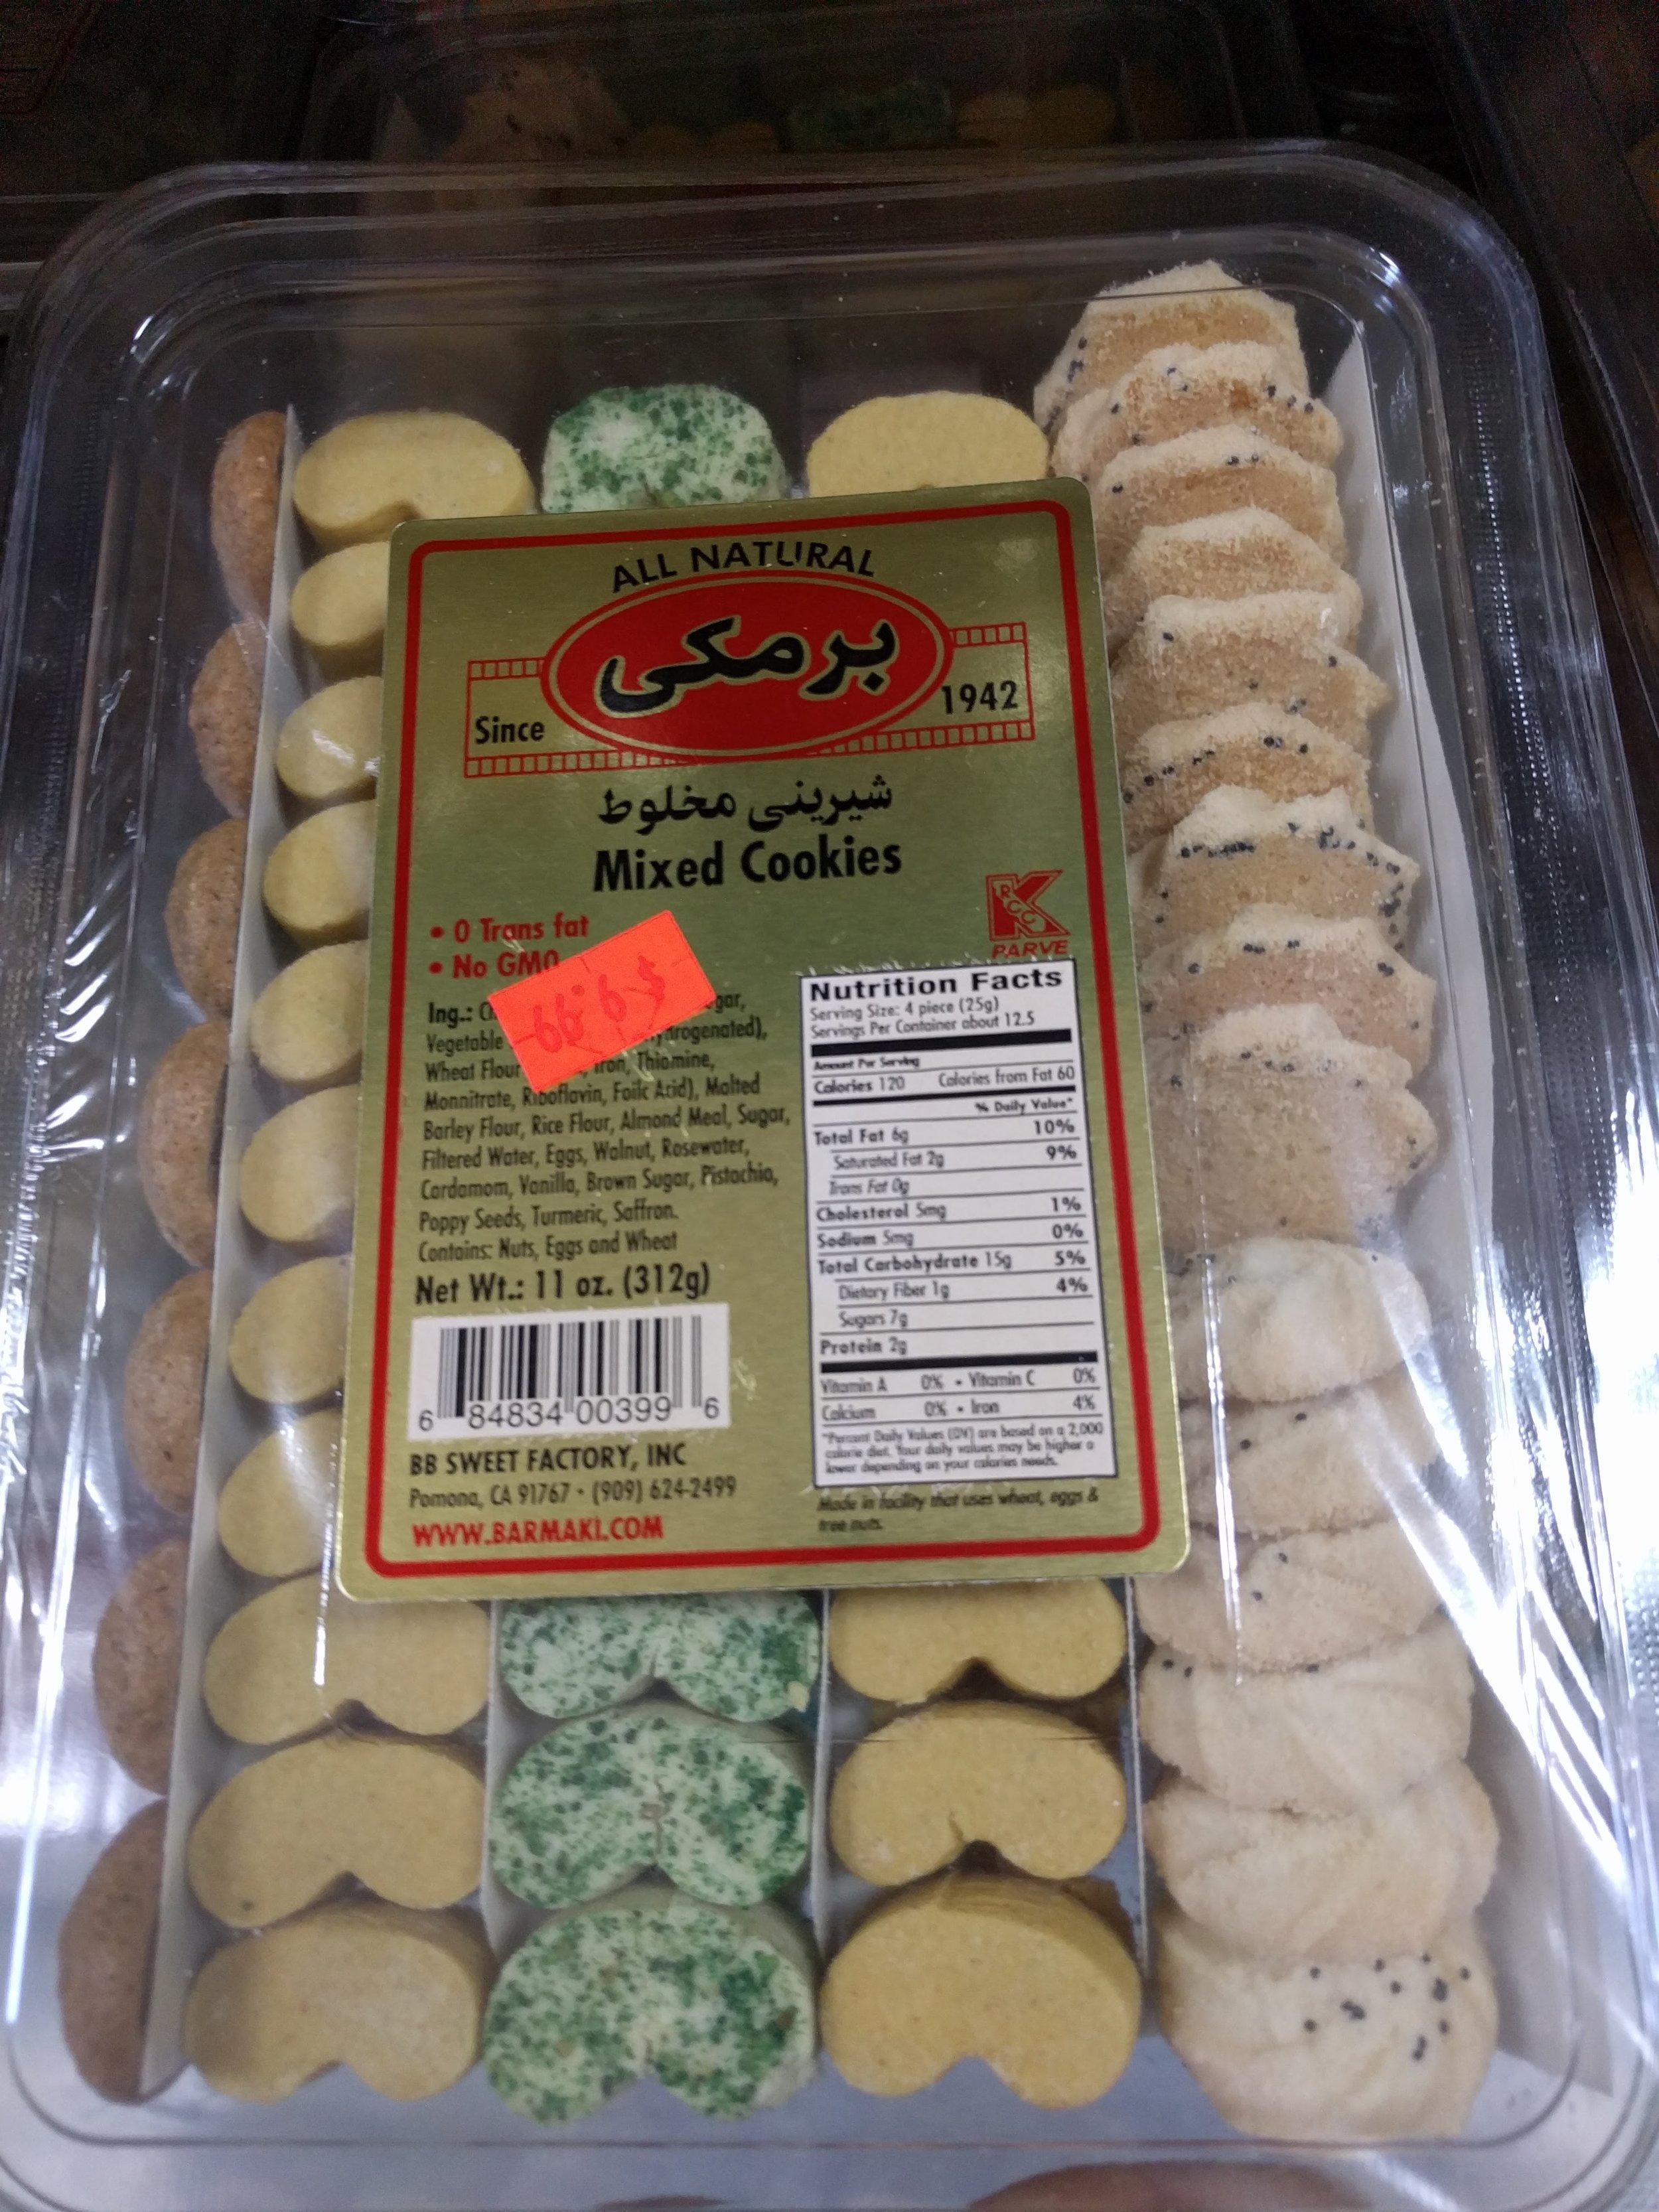 Mixed-cookies-Pak-Halal-International-Foods-12259-W-87th-St-Pkwy-Lenexa-KS-66215.jpg